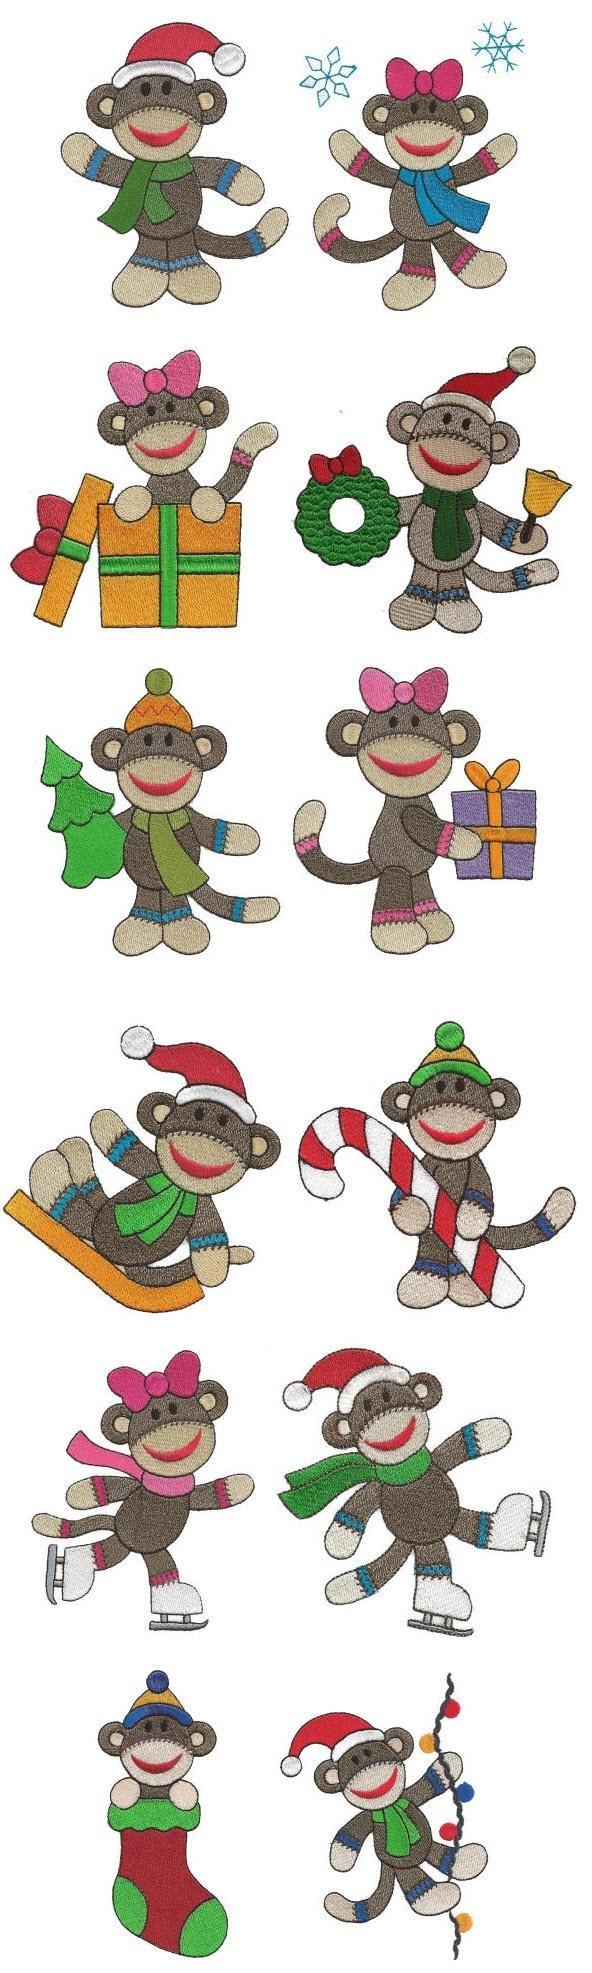 25+ Best Sock Monkey Decor Ideas On Pinterest | Sock Monkey Party With Regard To Sock Monkey Wall Art (View 12 of 20)